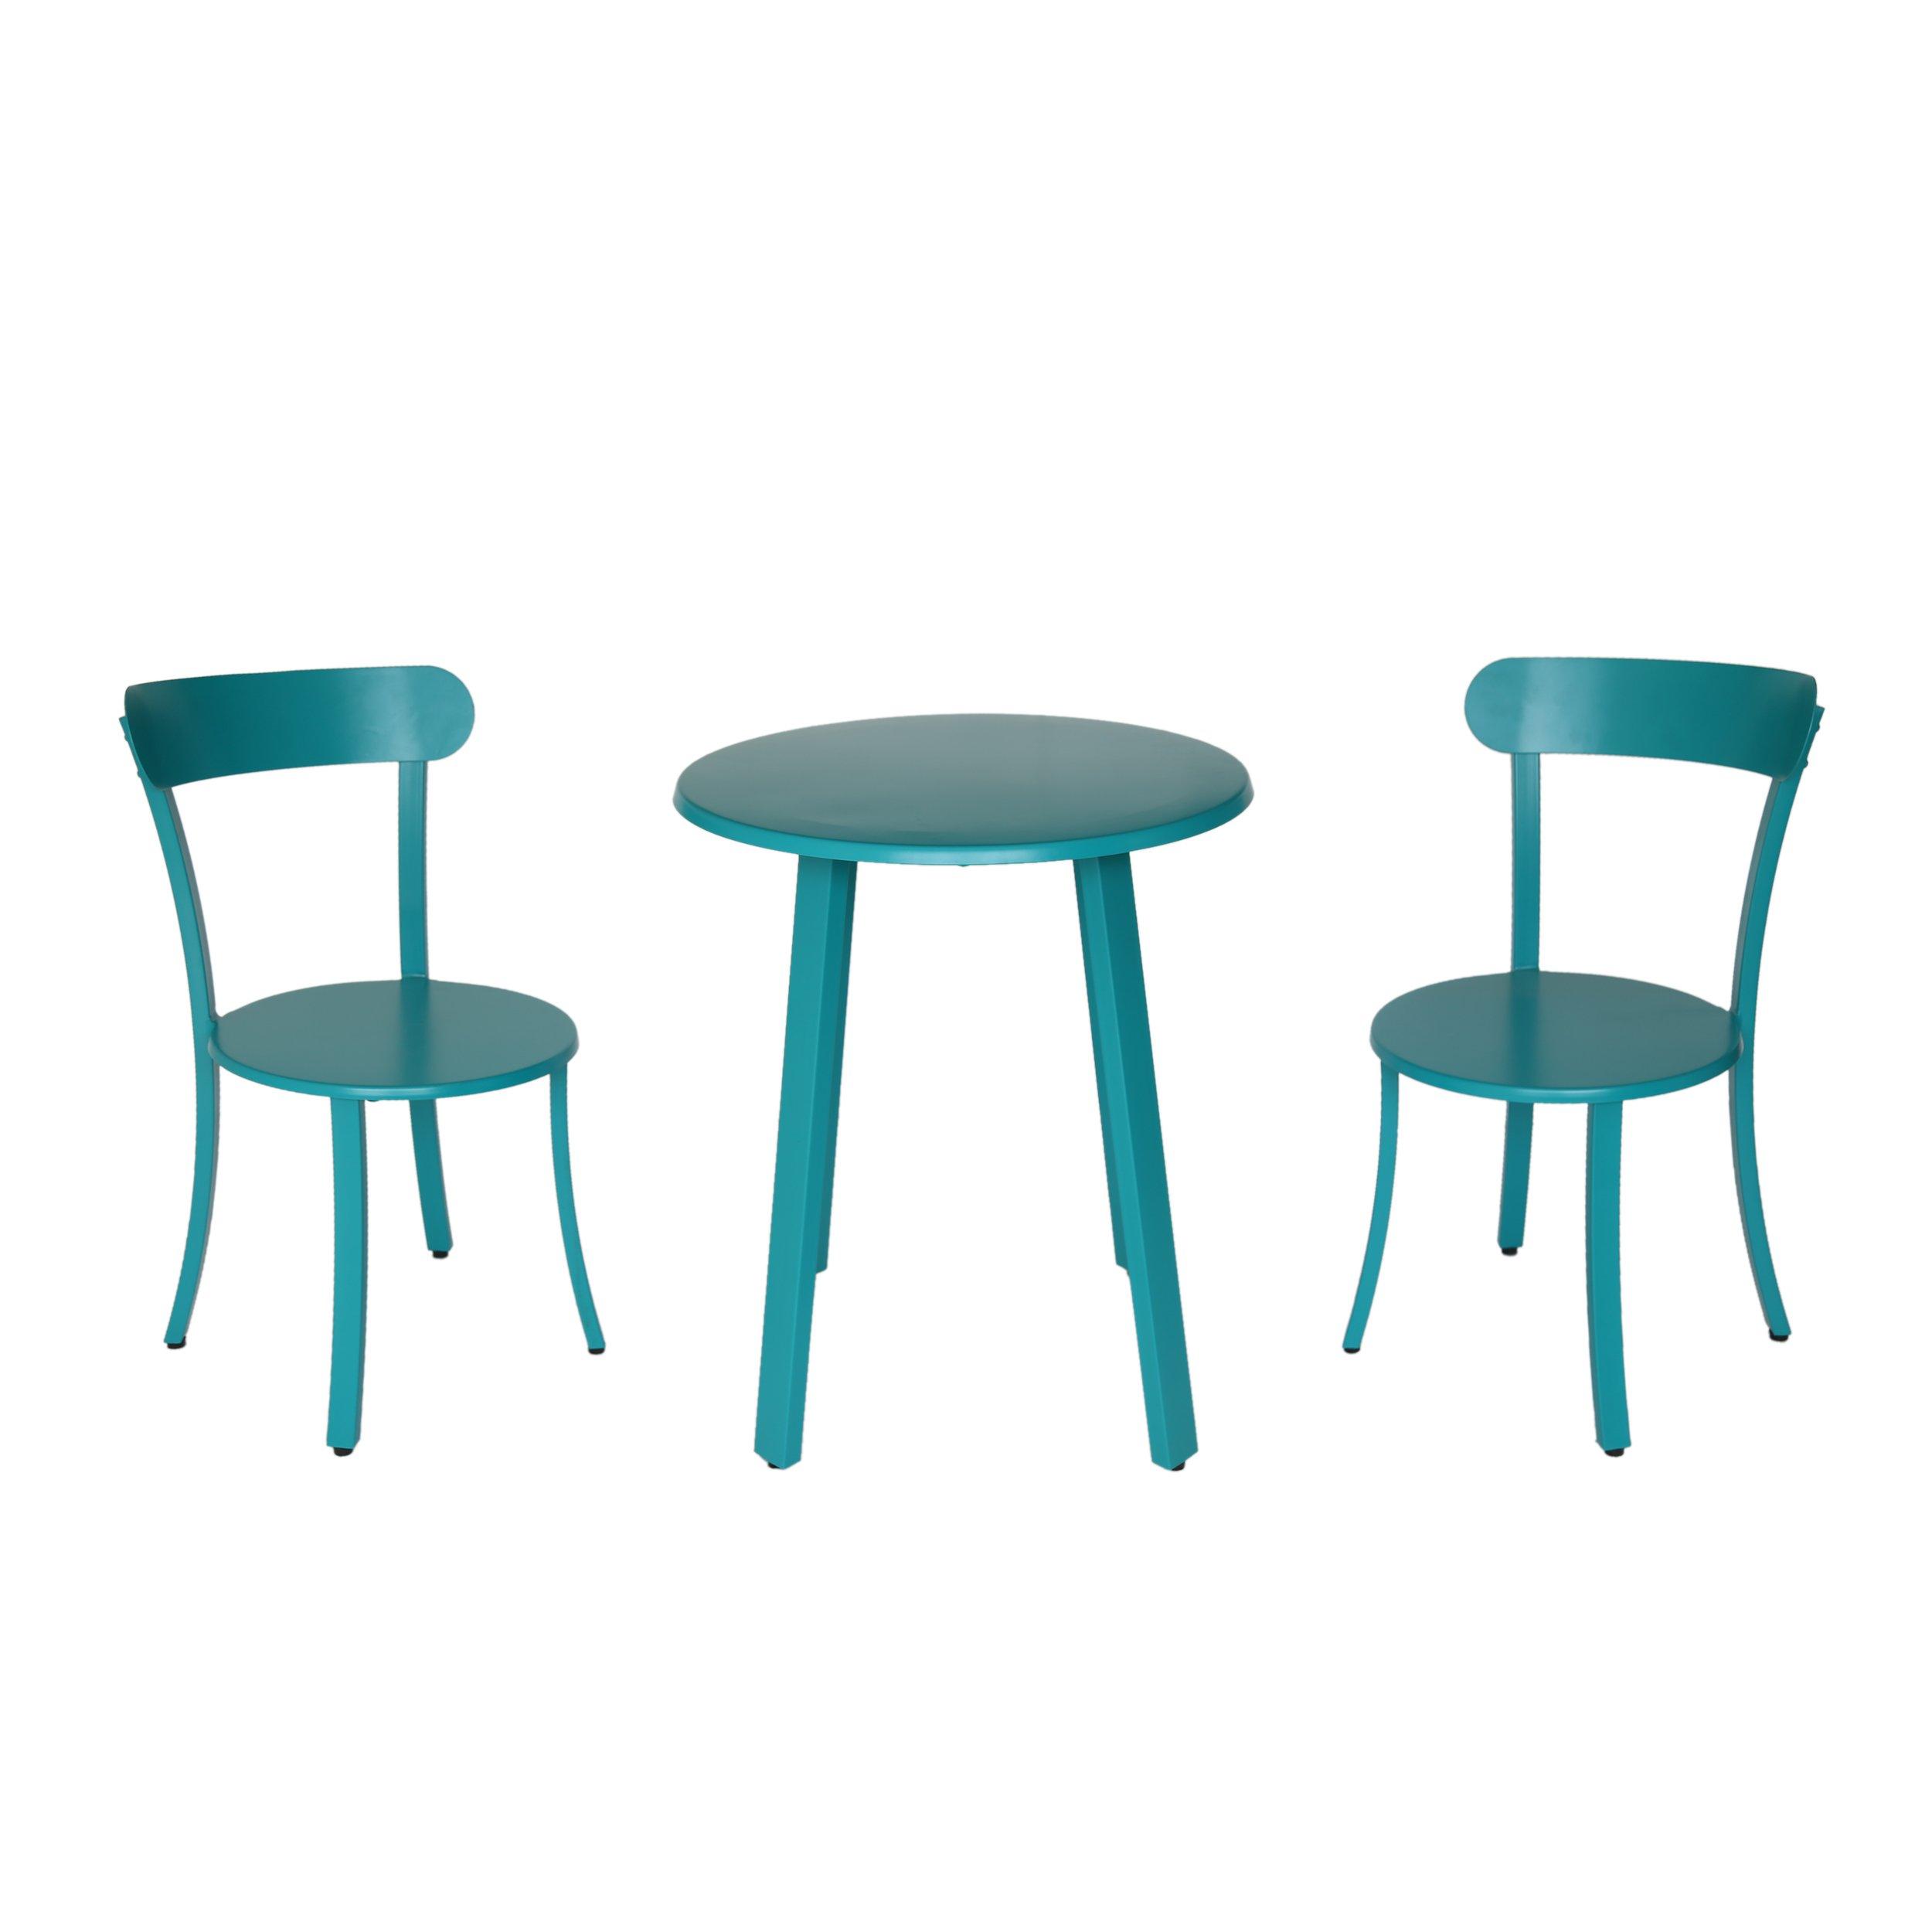 Great Deal Furniture 304958 Kelly Outdoor Bistro Set, Matte Teal